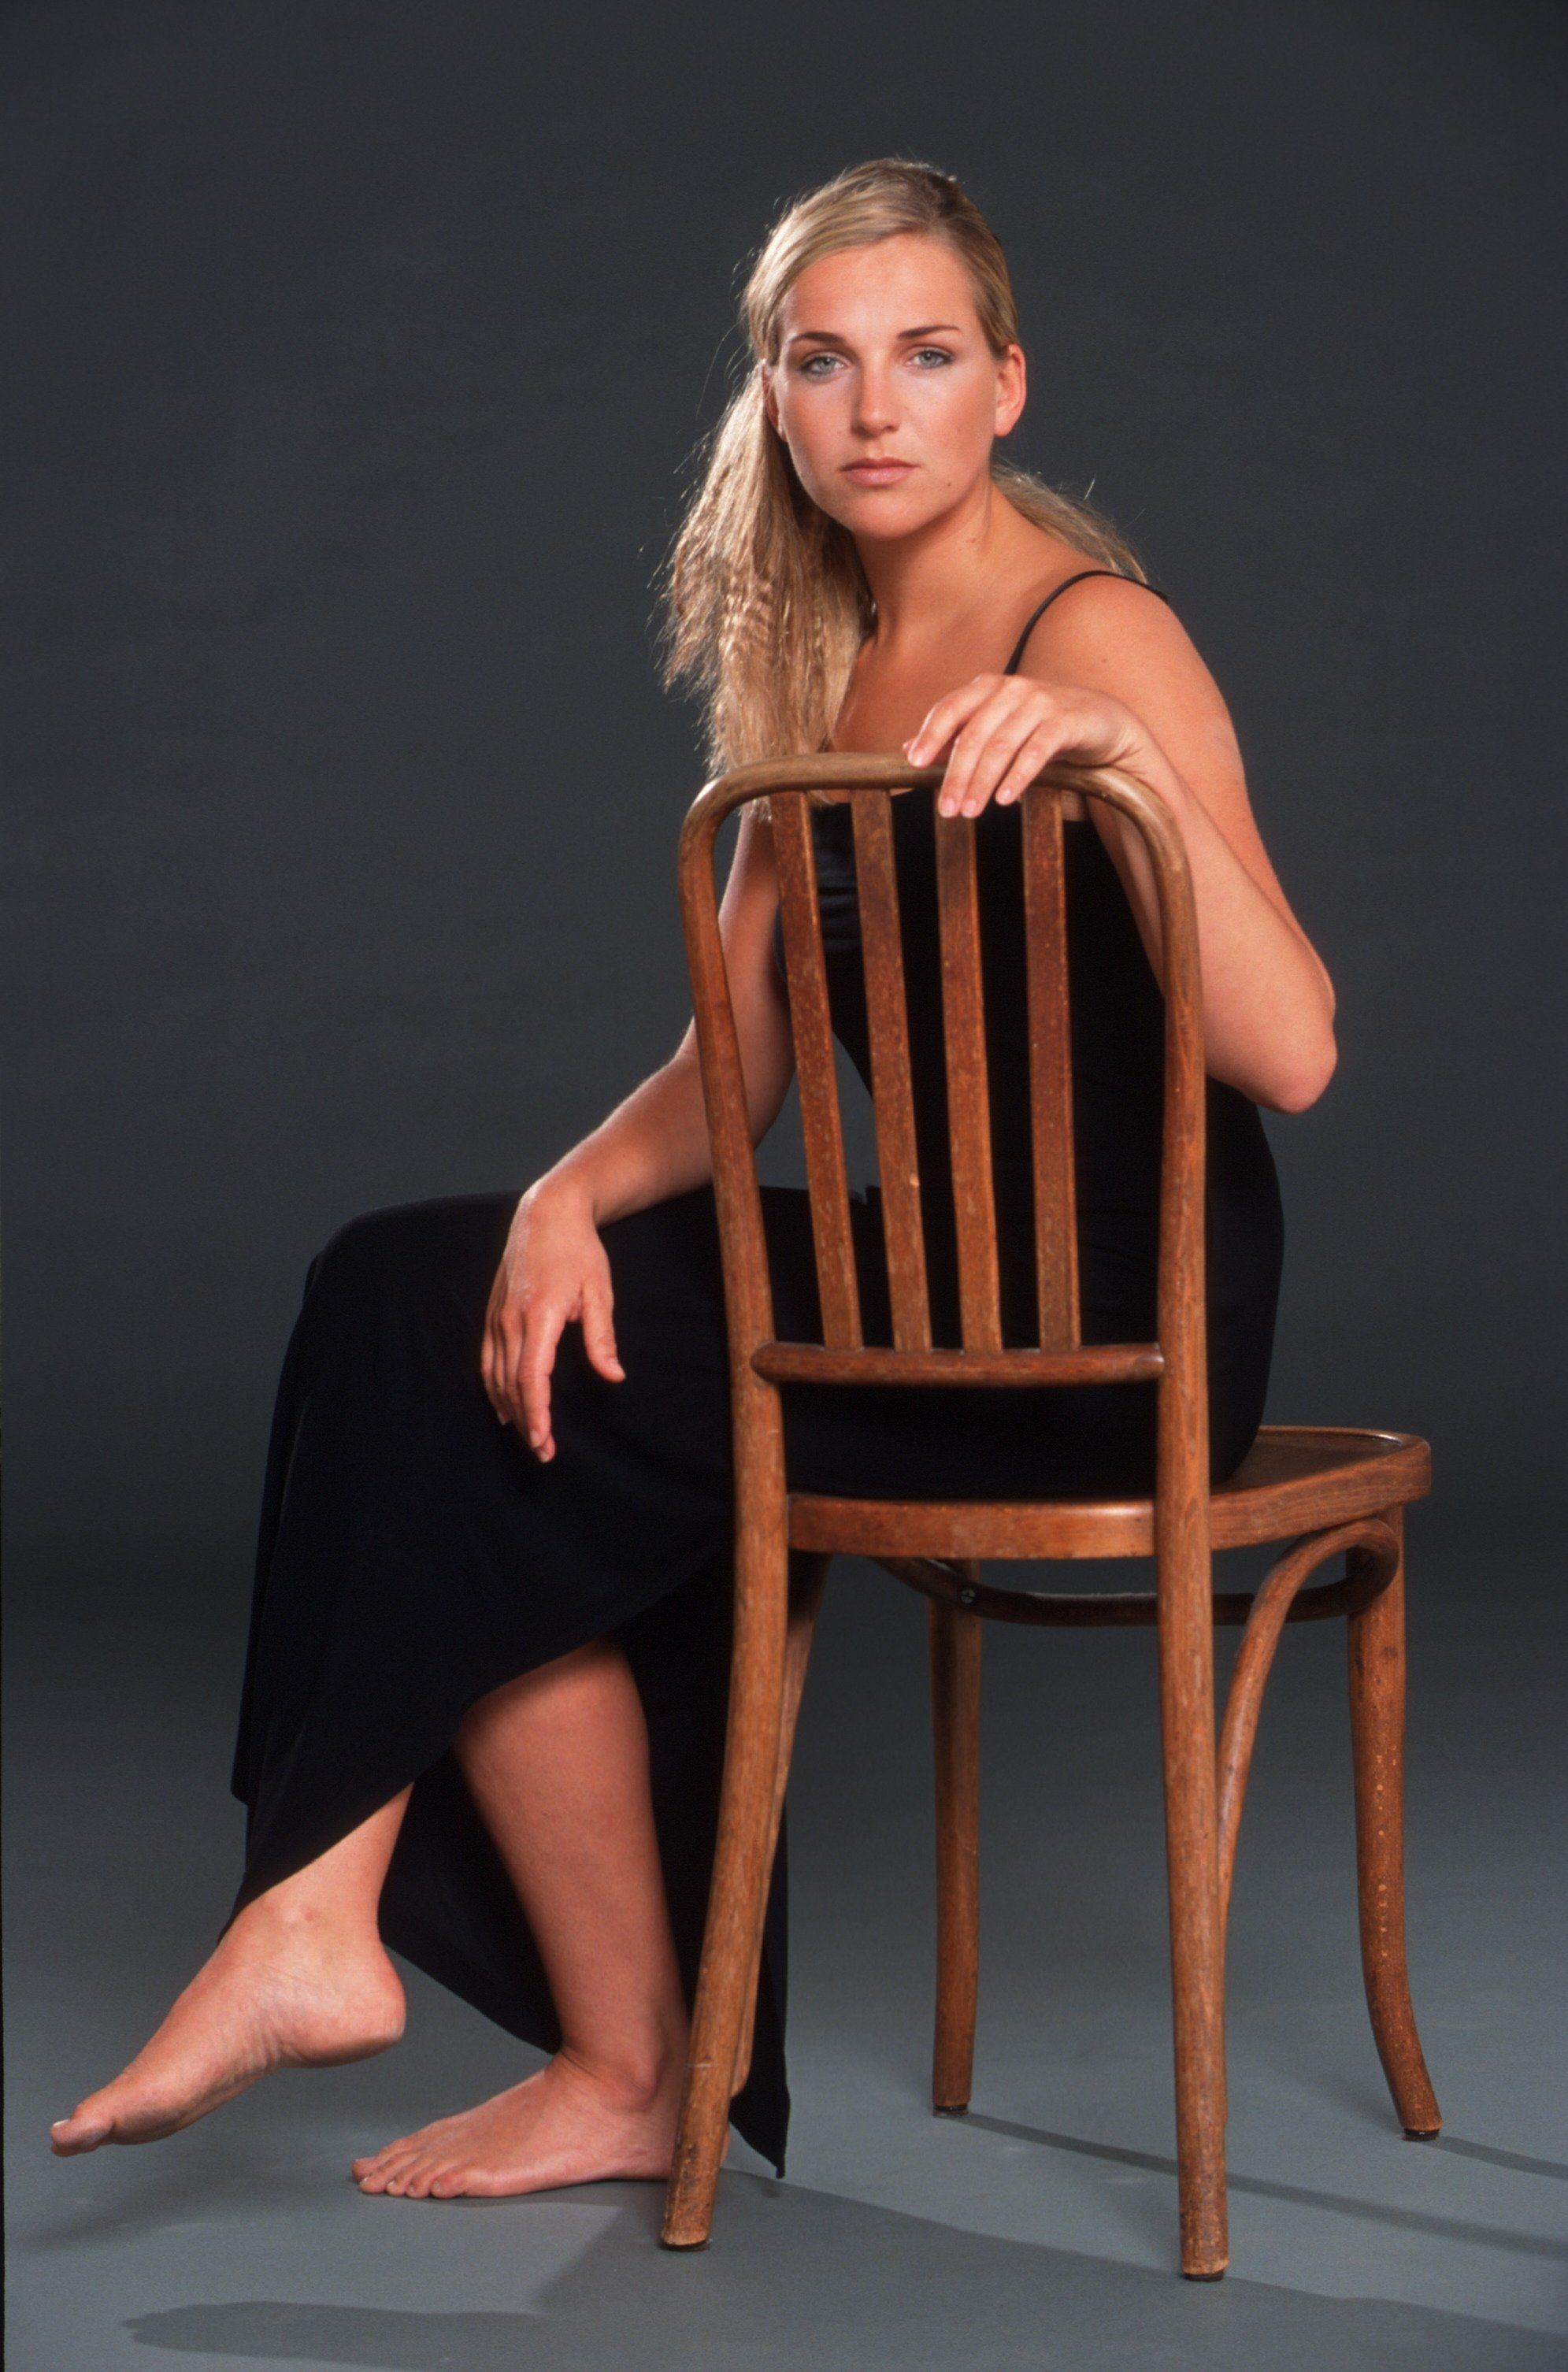 Http Pics Wikifeet Com Tanja Wedhorn Feet 117594 Jpg Tanja Wedhorn Frau Prominente